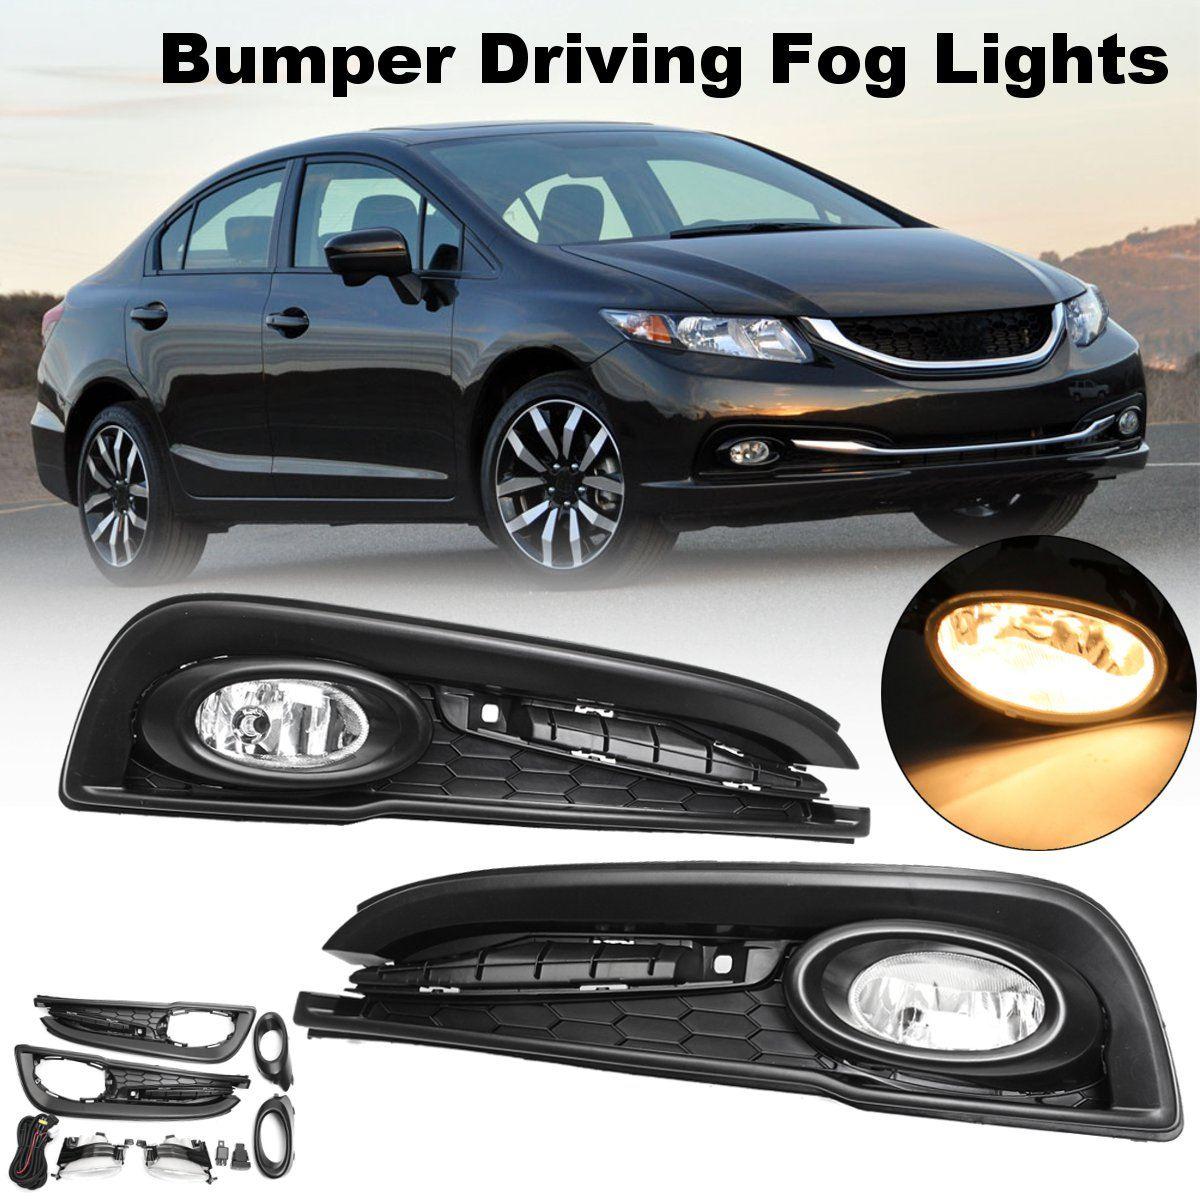 #33951-TR0-A51 #33901-TR0-A51 #HO2592135 #HO2593135 Pair Bumper Driving Fog Lights w/ Wiring Harness For Honda/Civic 4DR Sedan